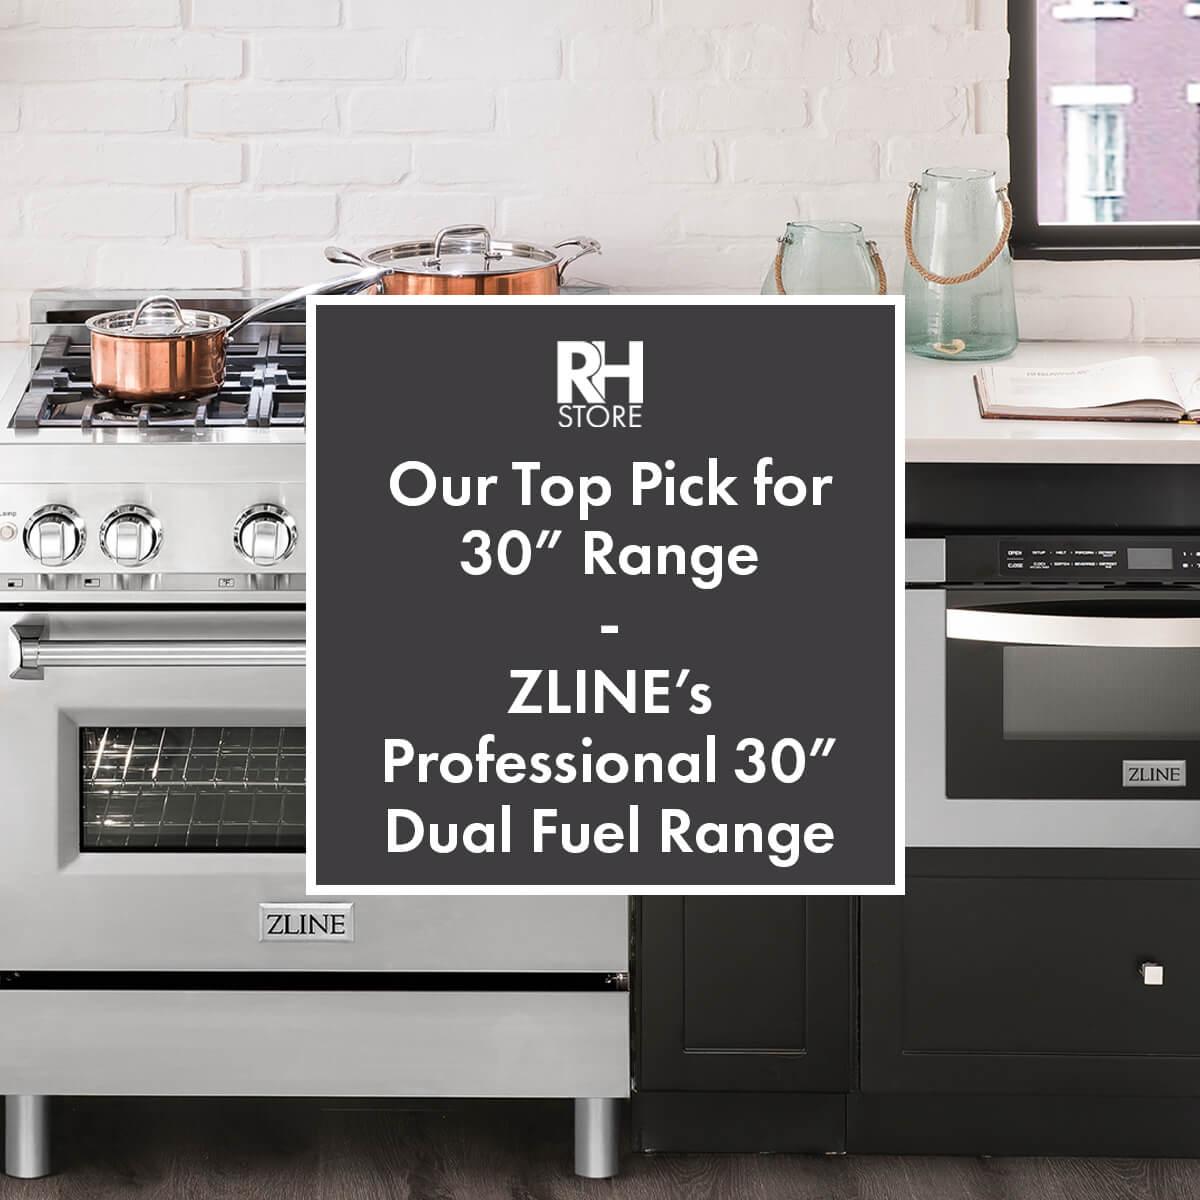 "Our Top Pick for 30"" Range  - ZLINE's Professional 30"" Dual Fuel Range"